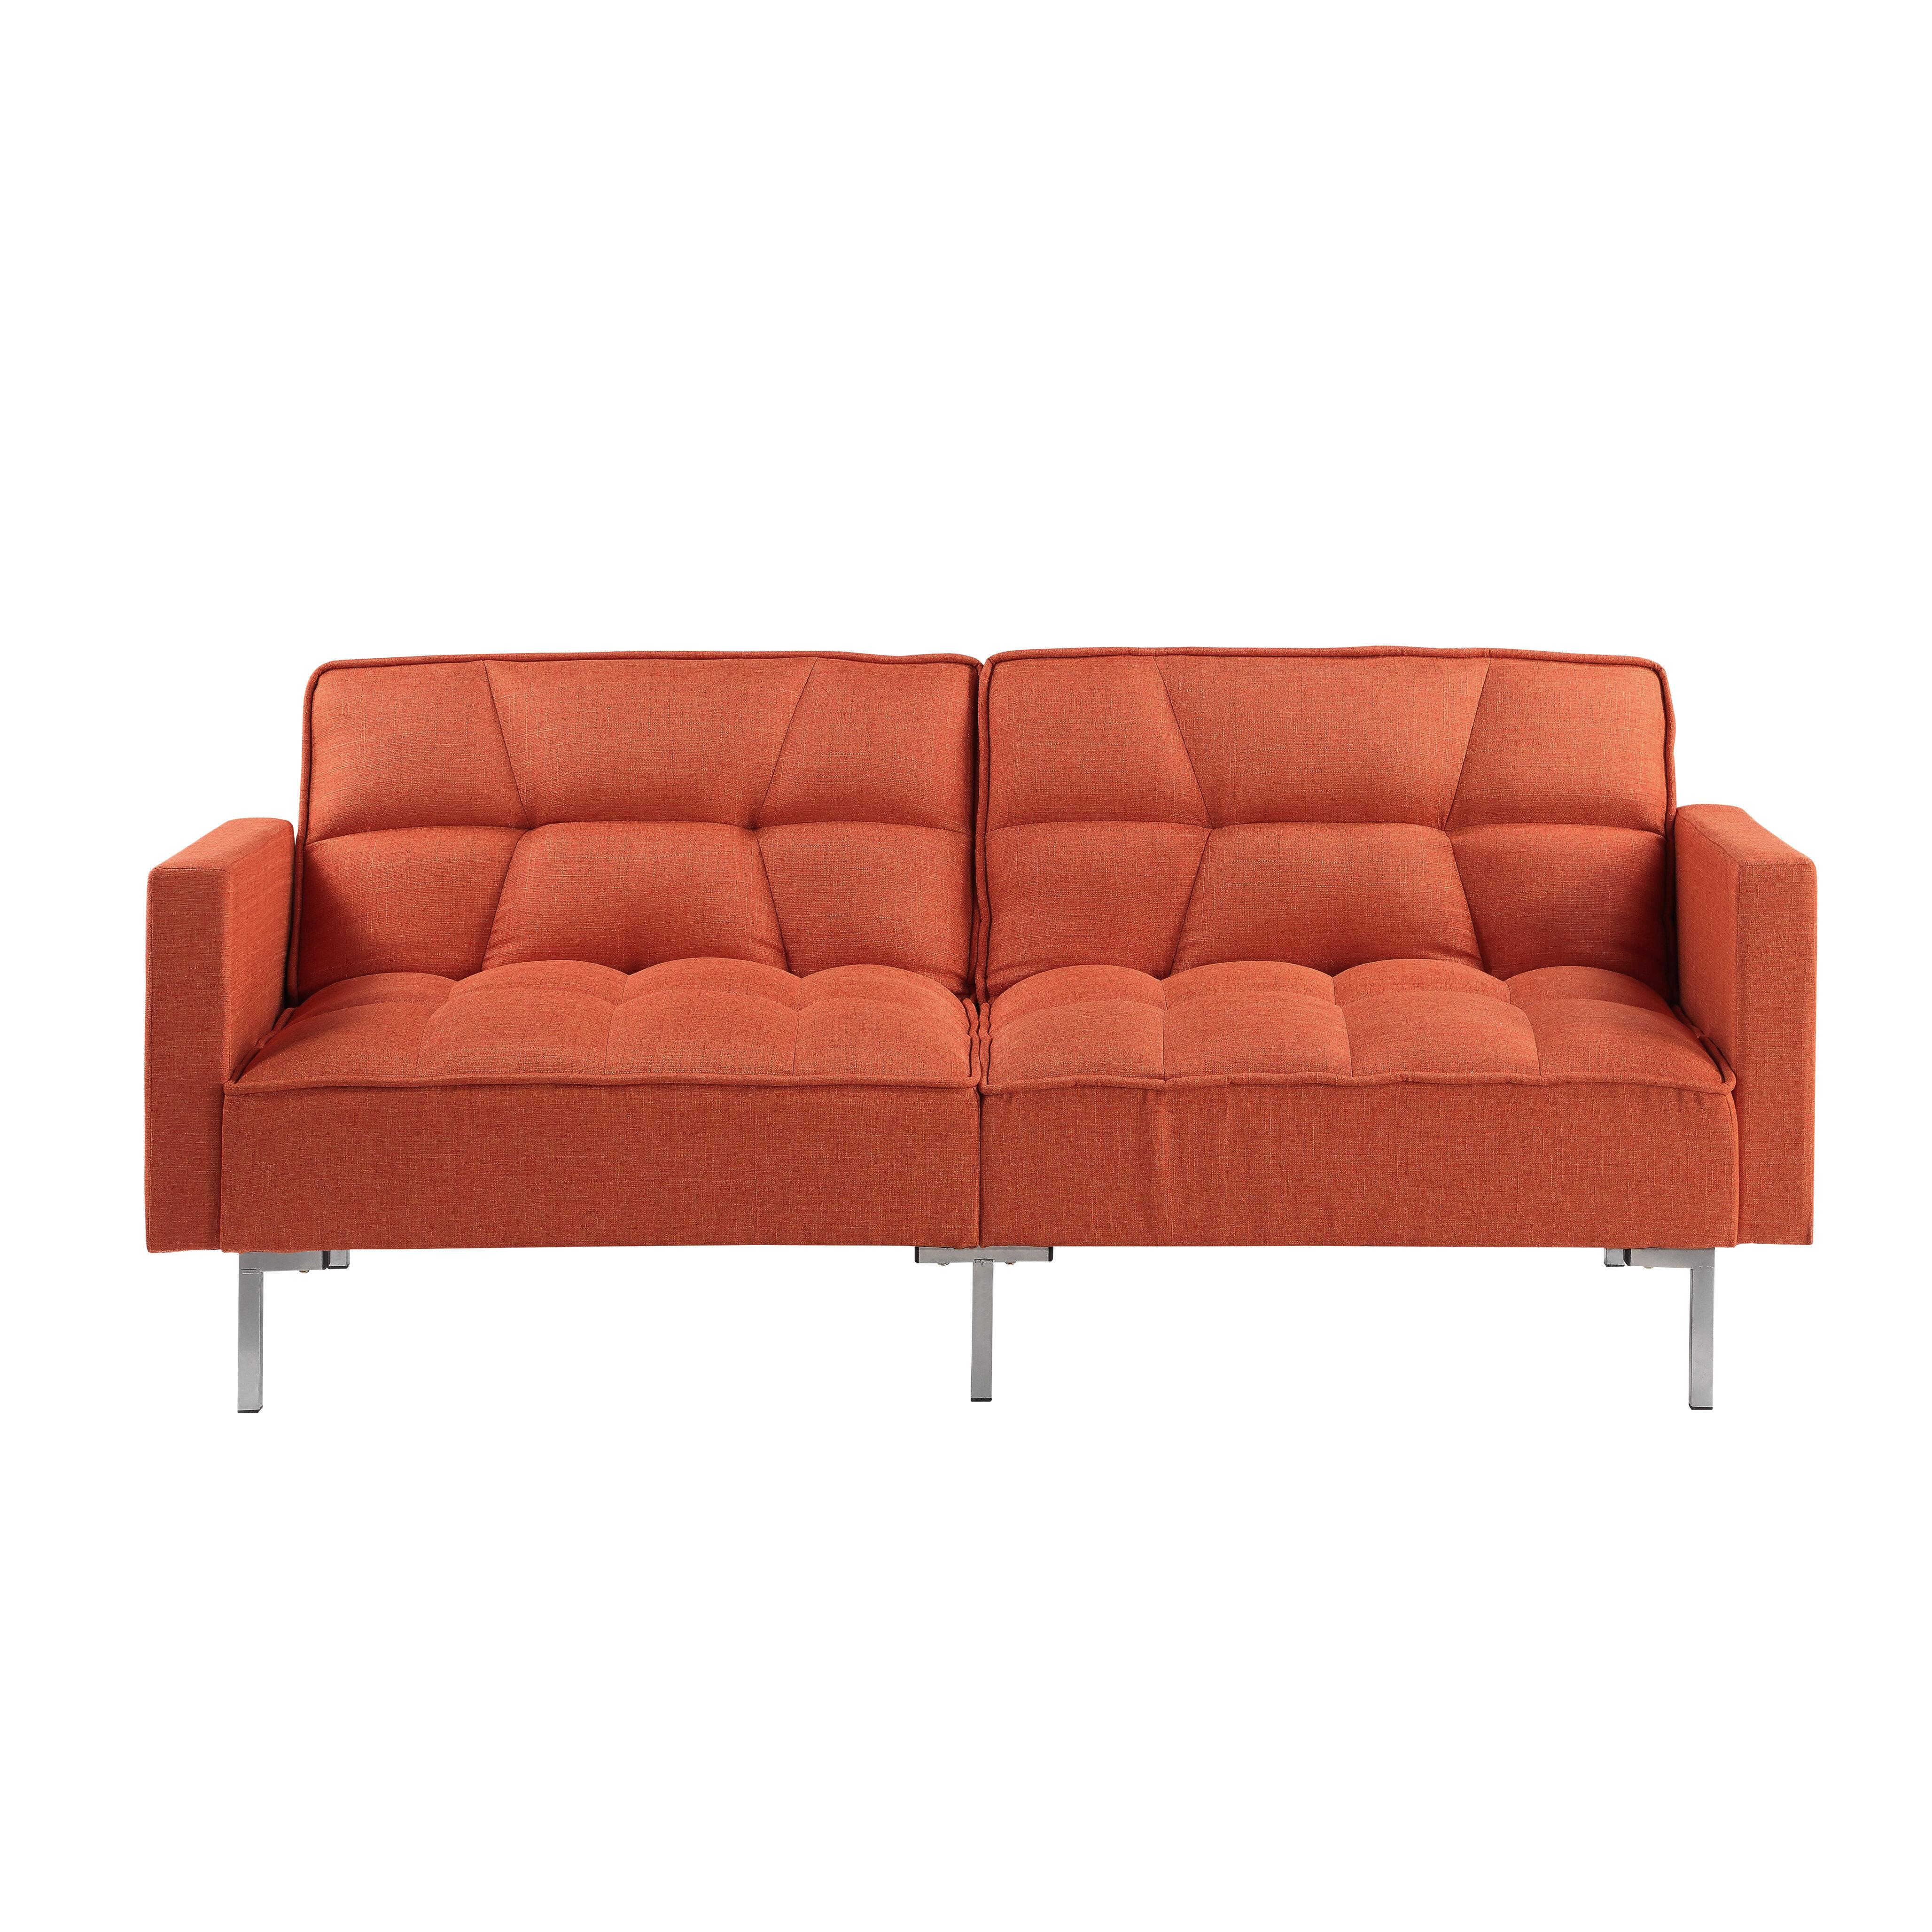 "Zanzibar 12.12"" Square Arm Sofa Bed"